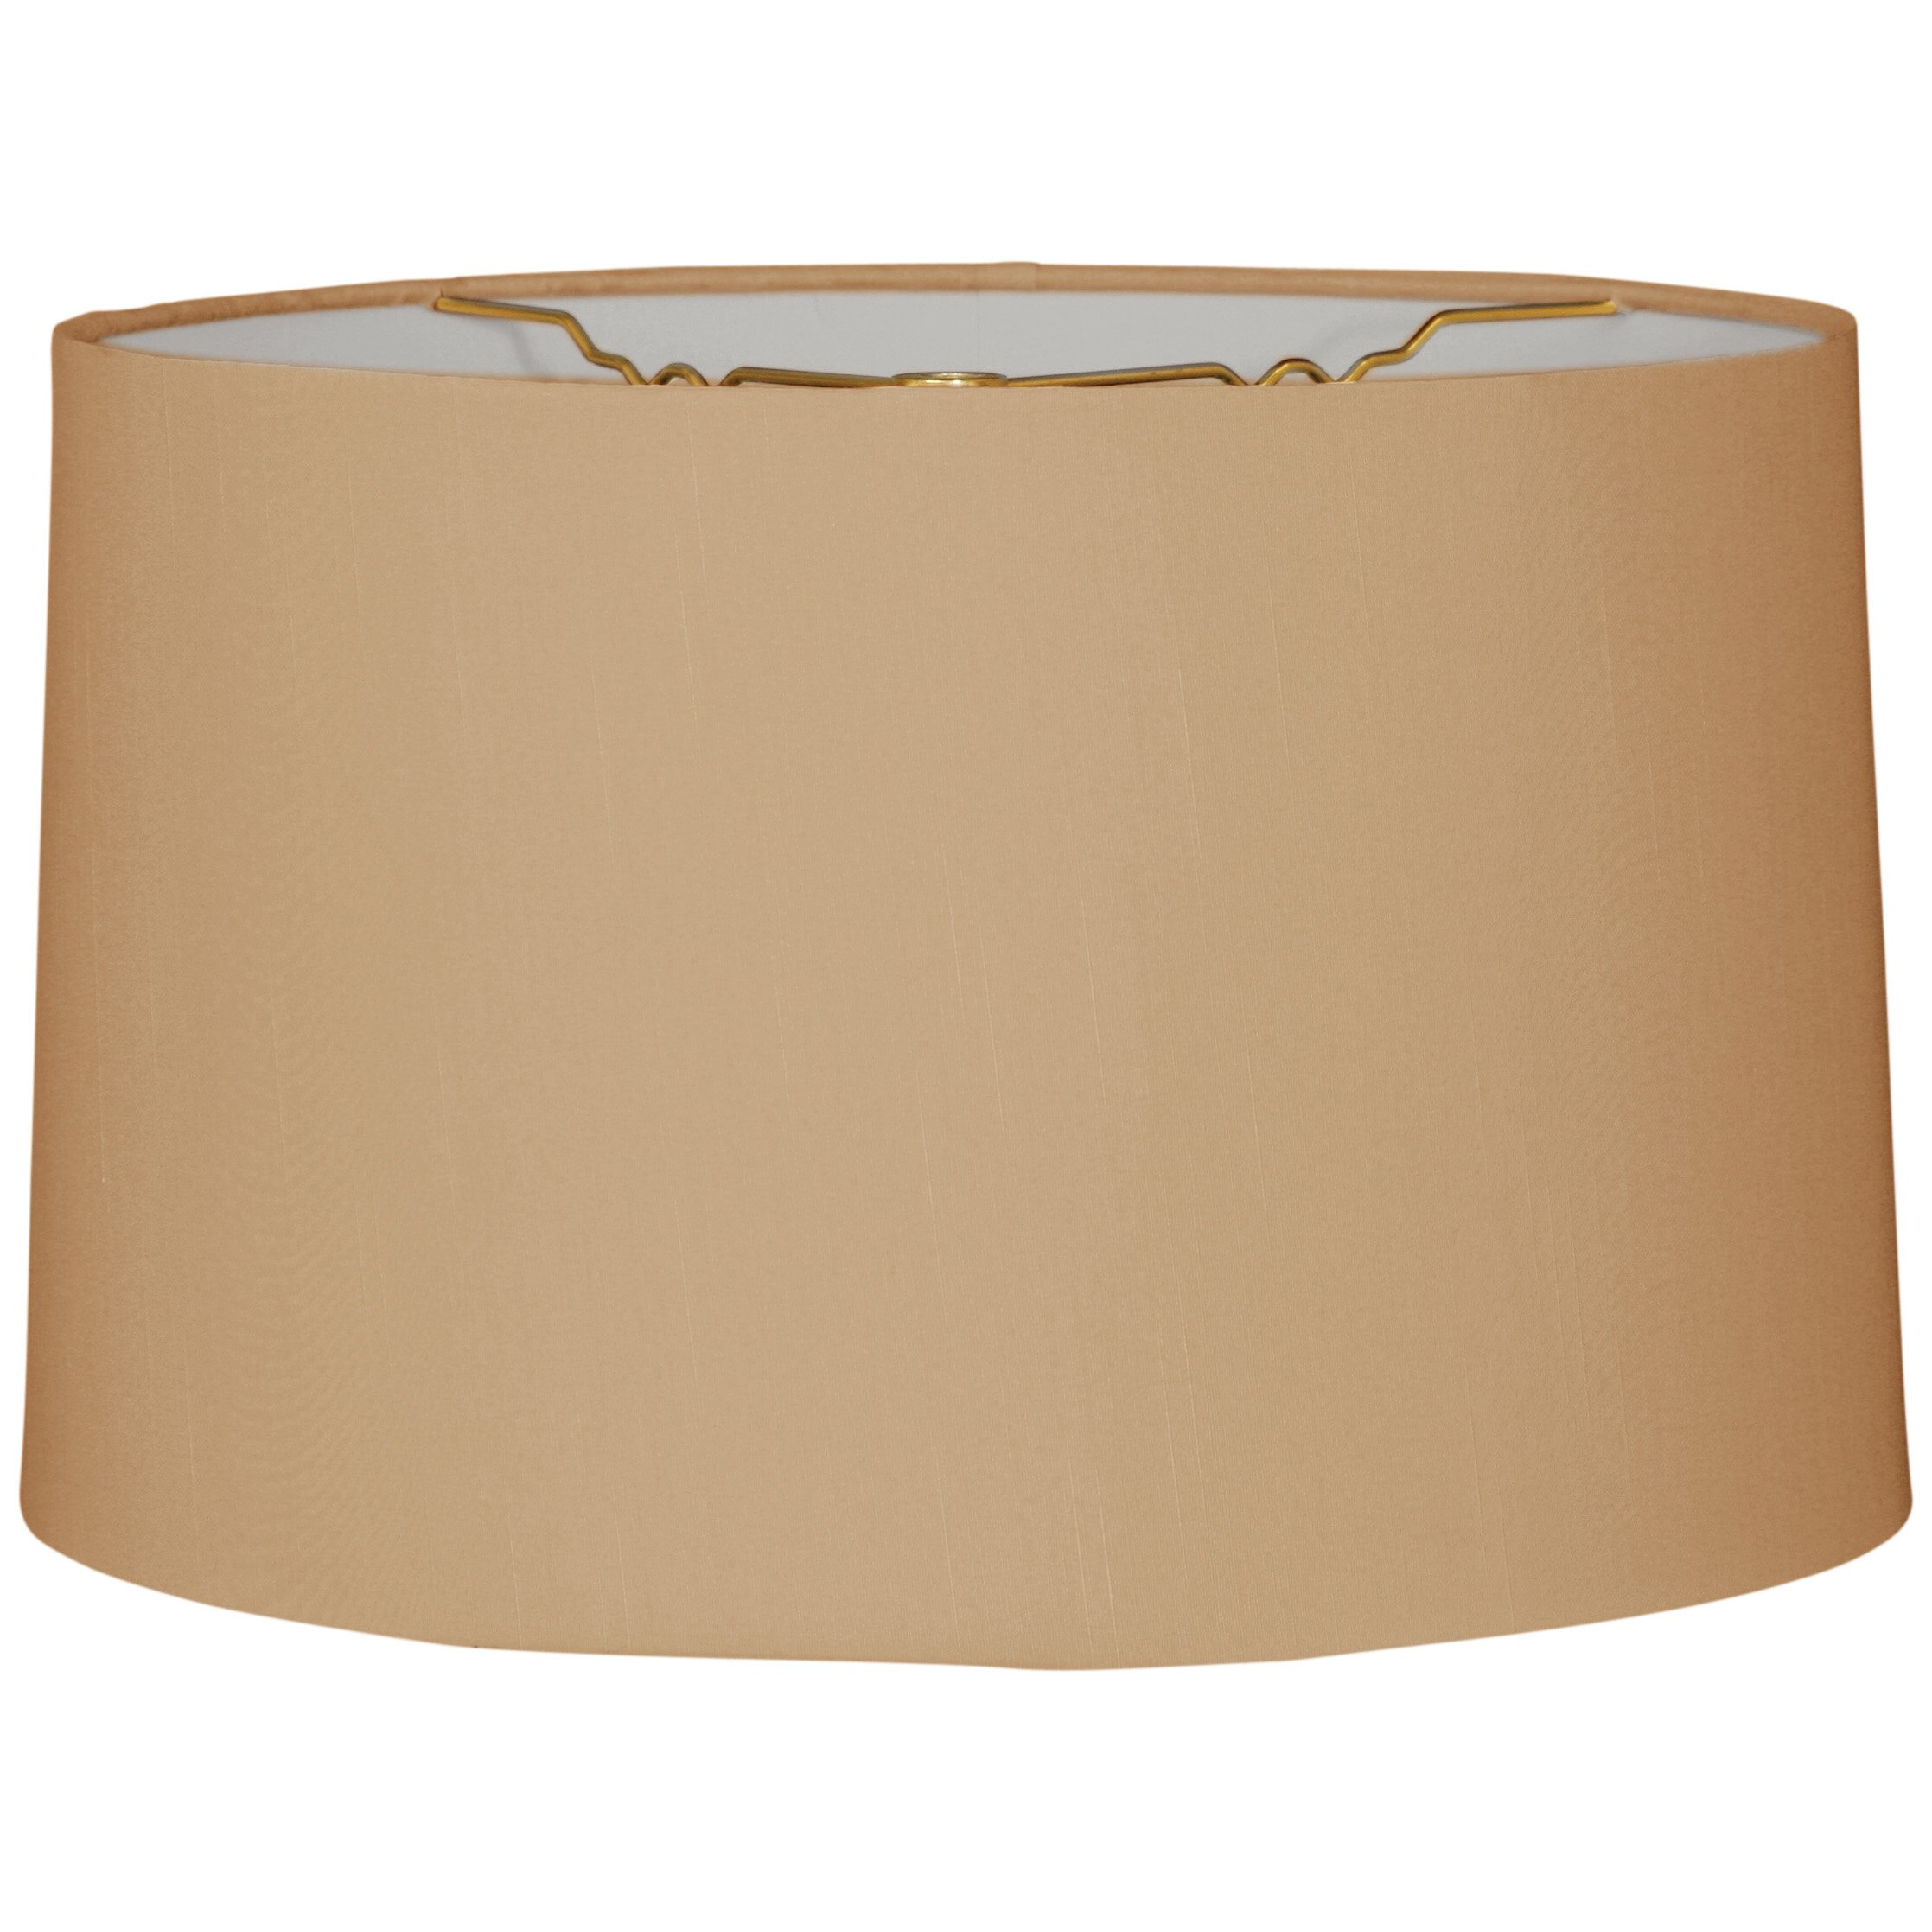 tierney 18 linen drum lamp shade reviews joss main. Black Bedroom Furniture Sets. Home Design Ideas